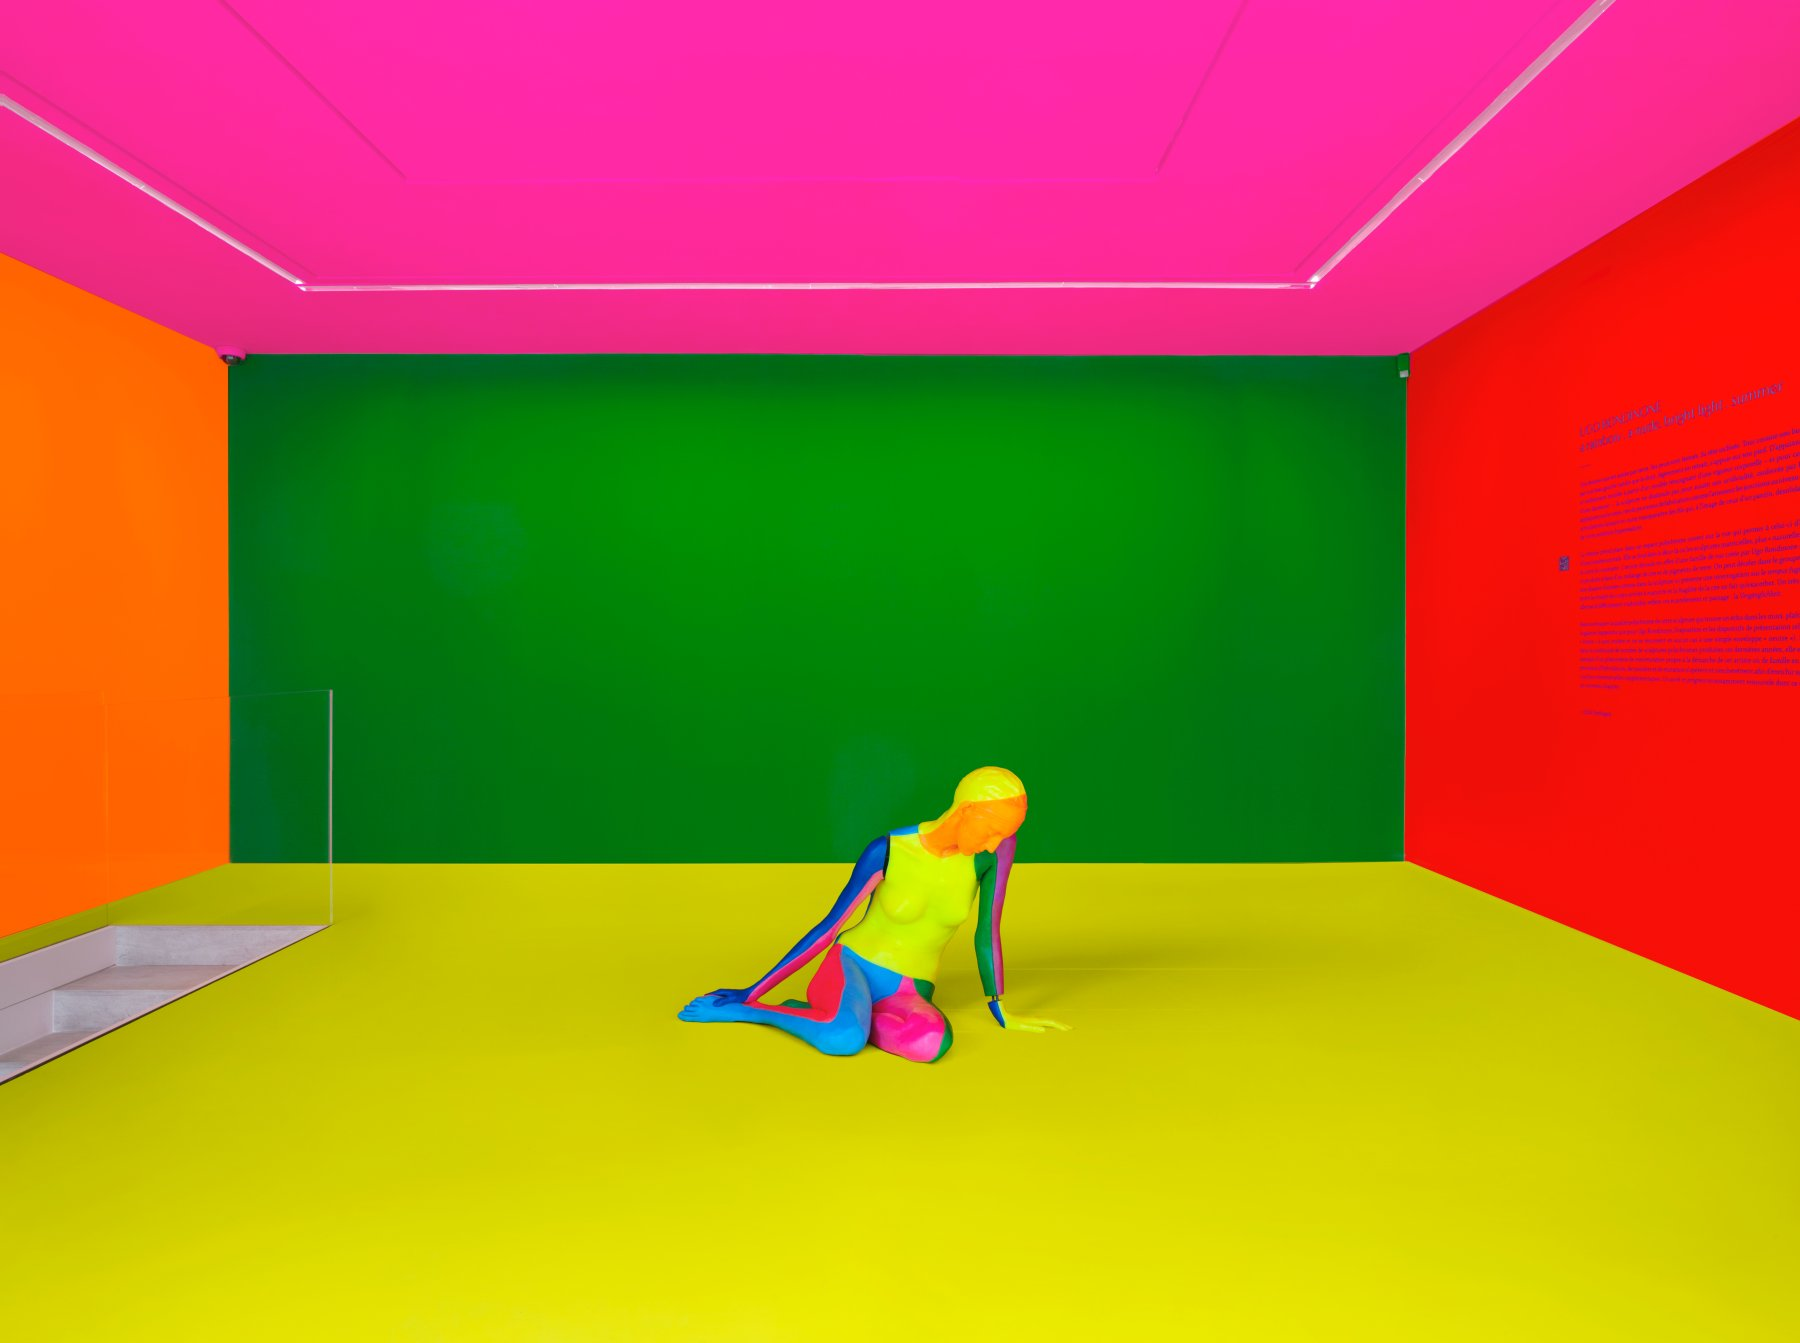 kamel mennour Ugo Rondinone a rainbow 1